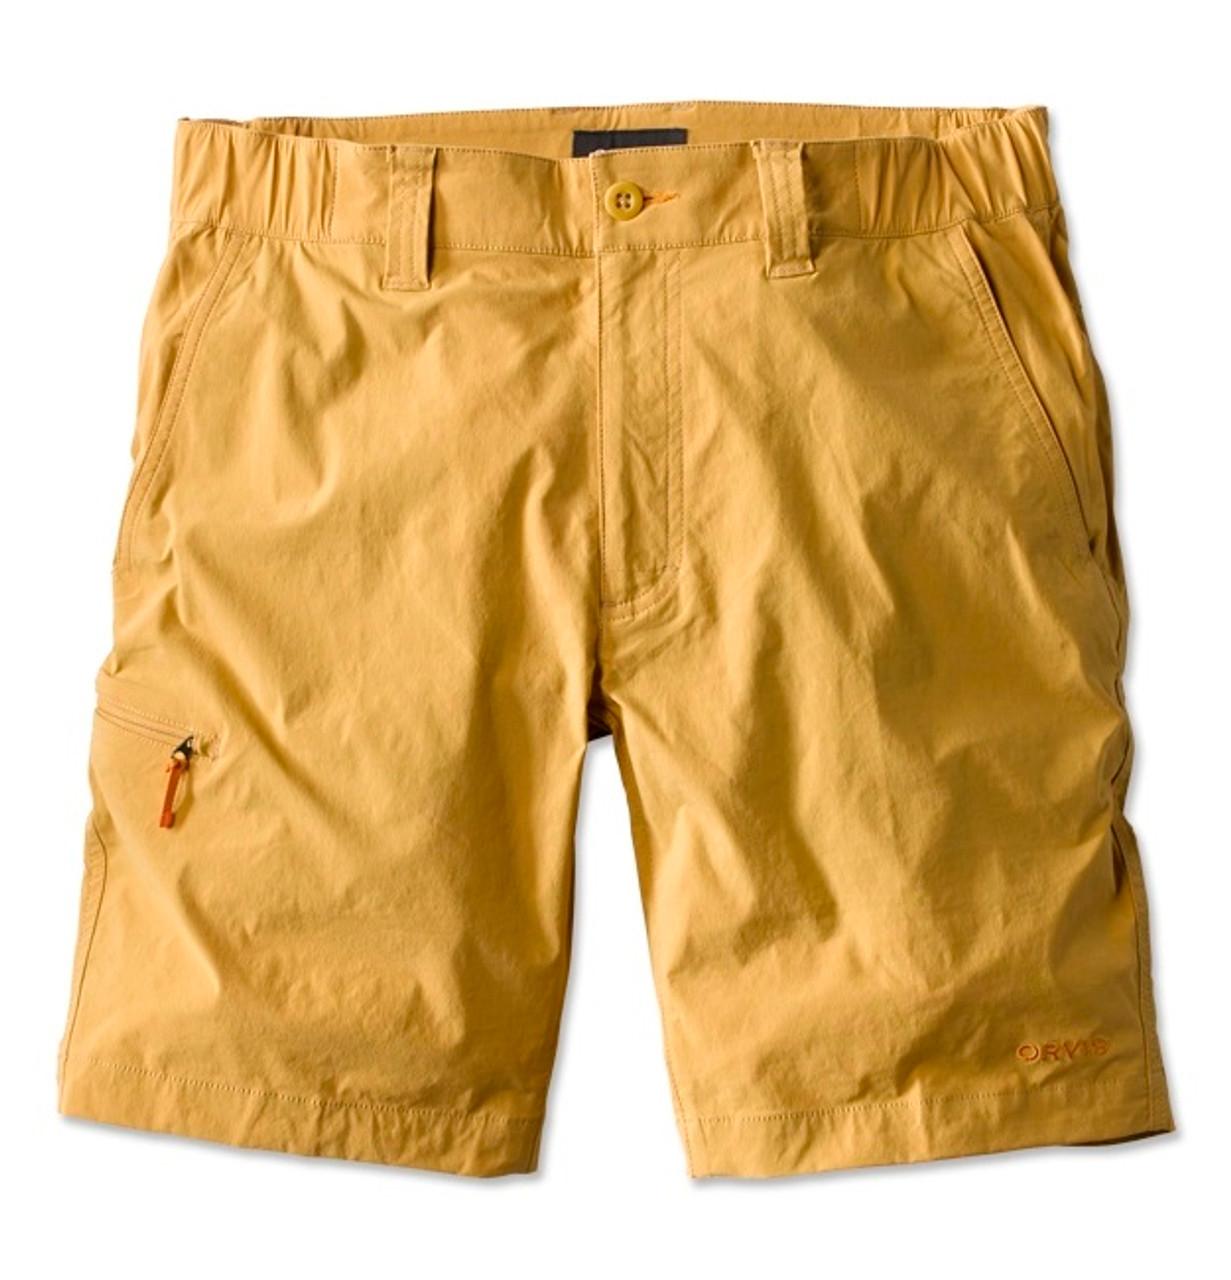 Orvis Men's Jackson Quick Dry Stretch Short 20MC